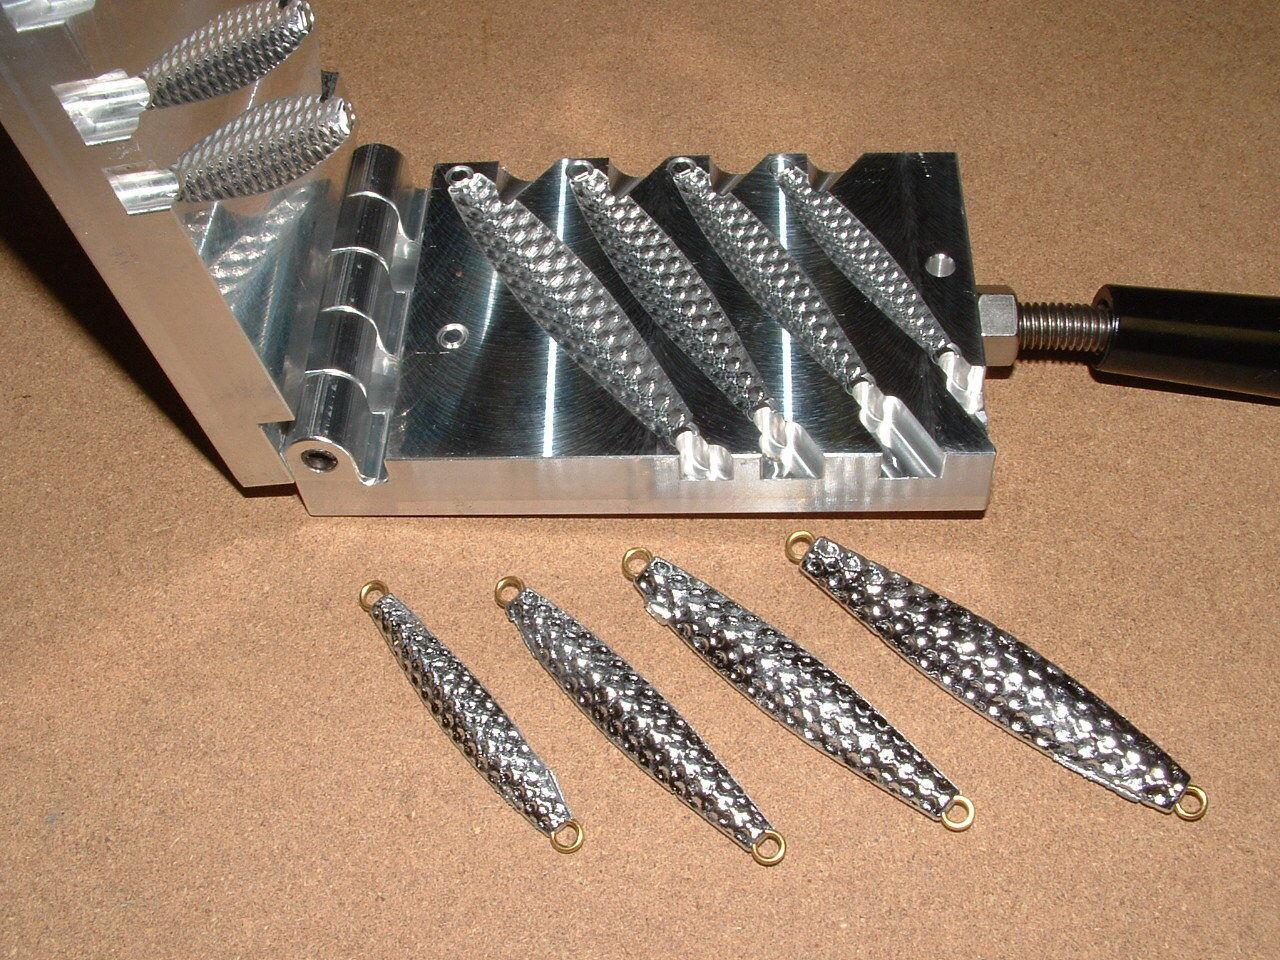 Saltwater D Jig-3 Bumpy Moule 1 2,3 4,1,1.5oz CNC Aluminium Diamond